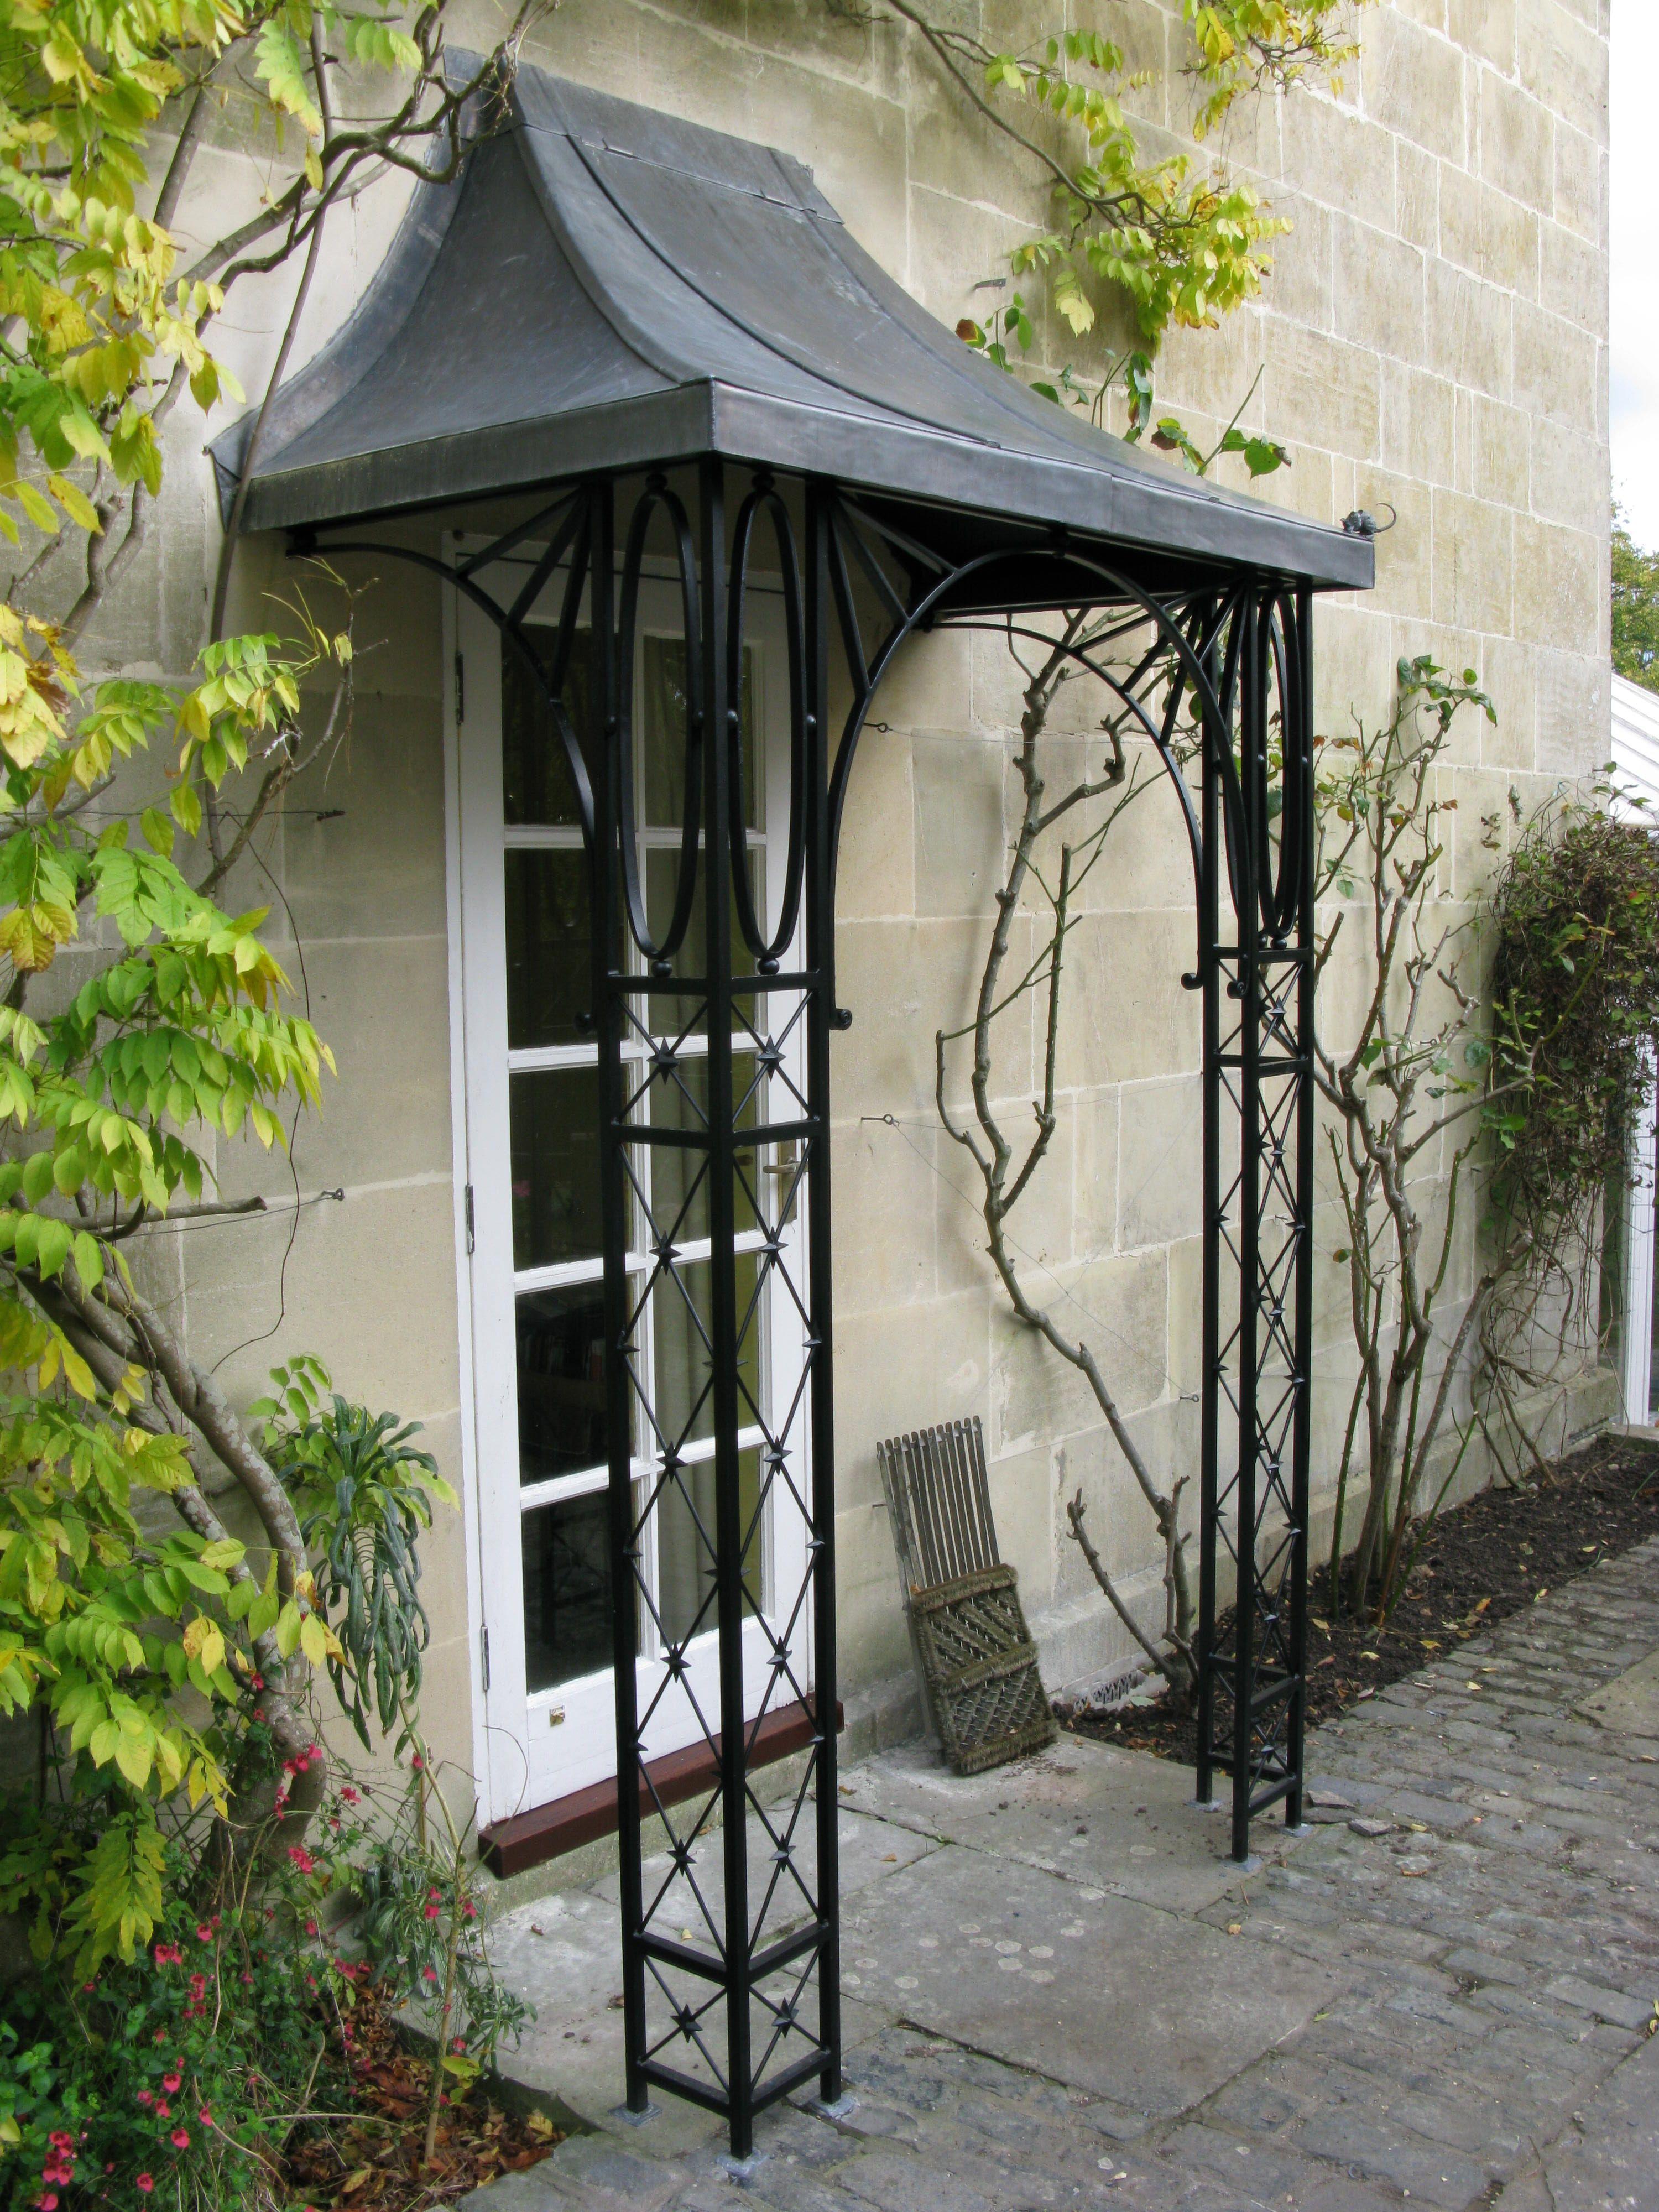 Decorative Metal Porch Posts Wrought Iron Porch Columns Google Search Cottage Pinterest